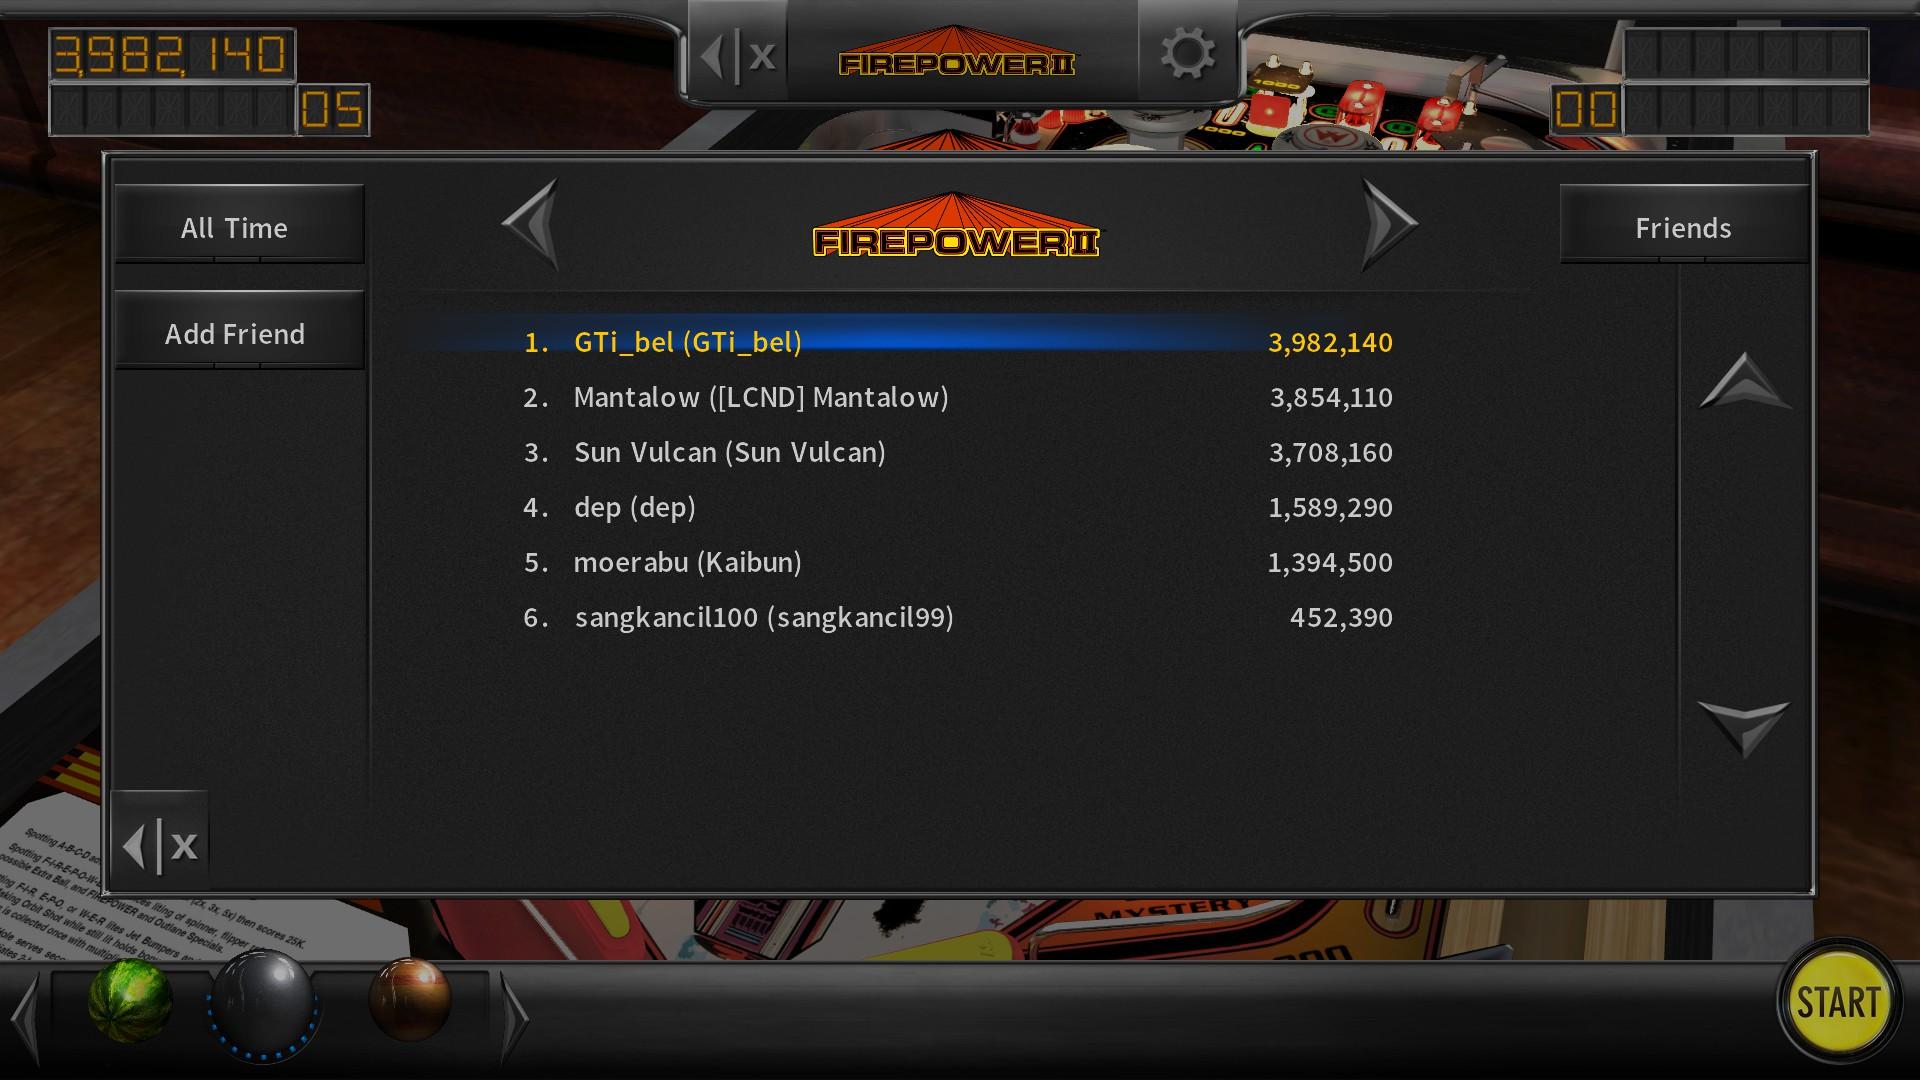 GTibel: Pinball Arcade: Firepower II (PC) 3,982,140 points on 2018-02-25 05:48:50